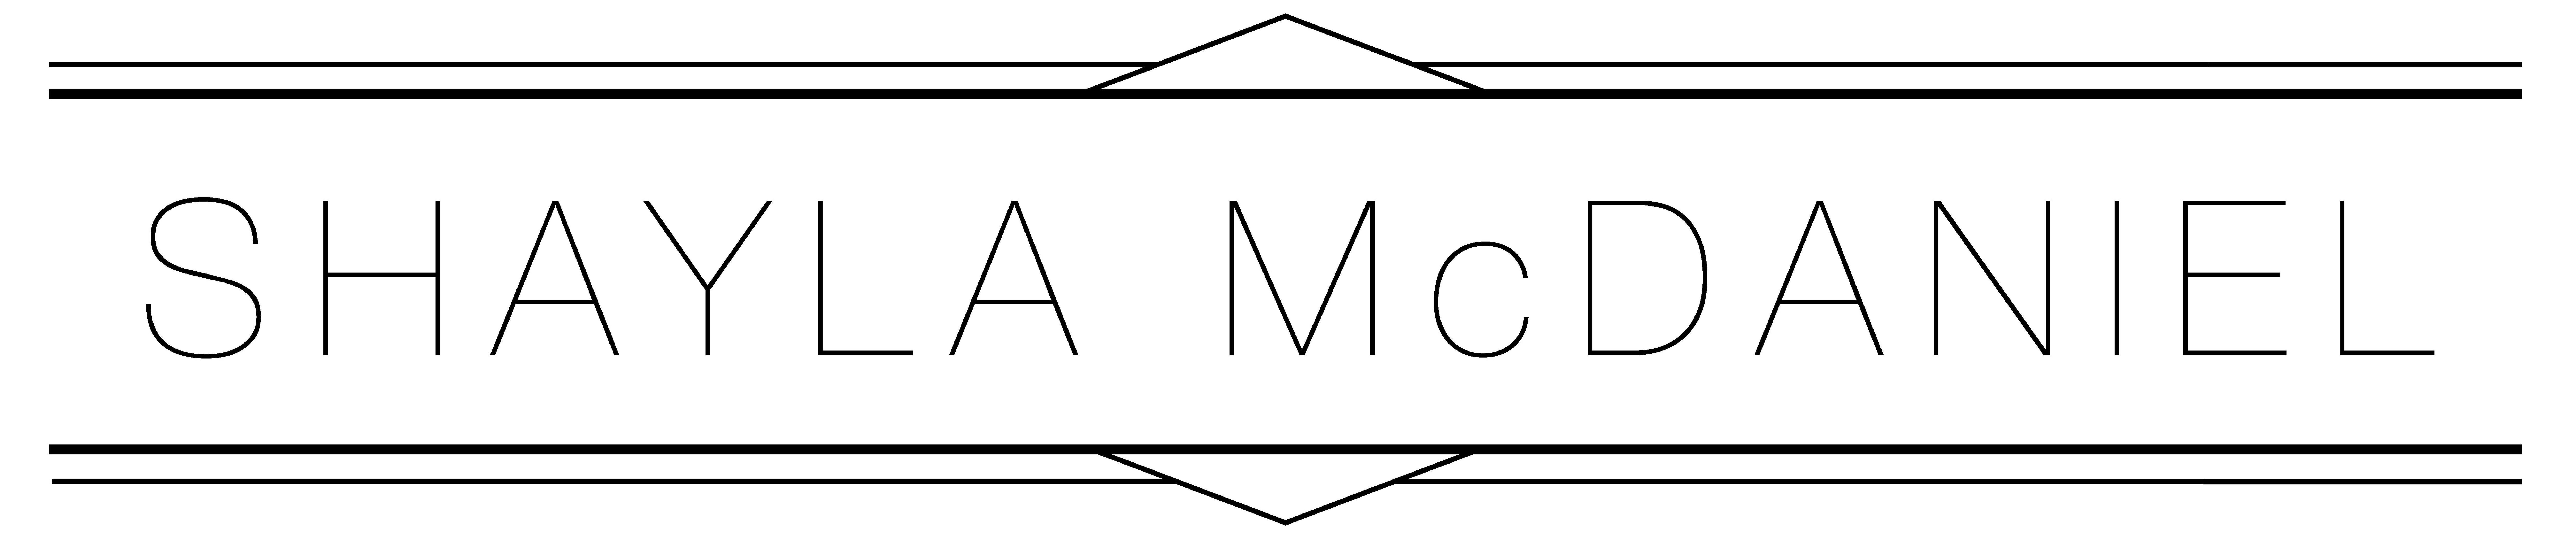 ShaylaMcDaniel-logo10334x2167